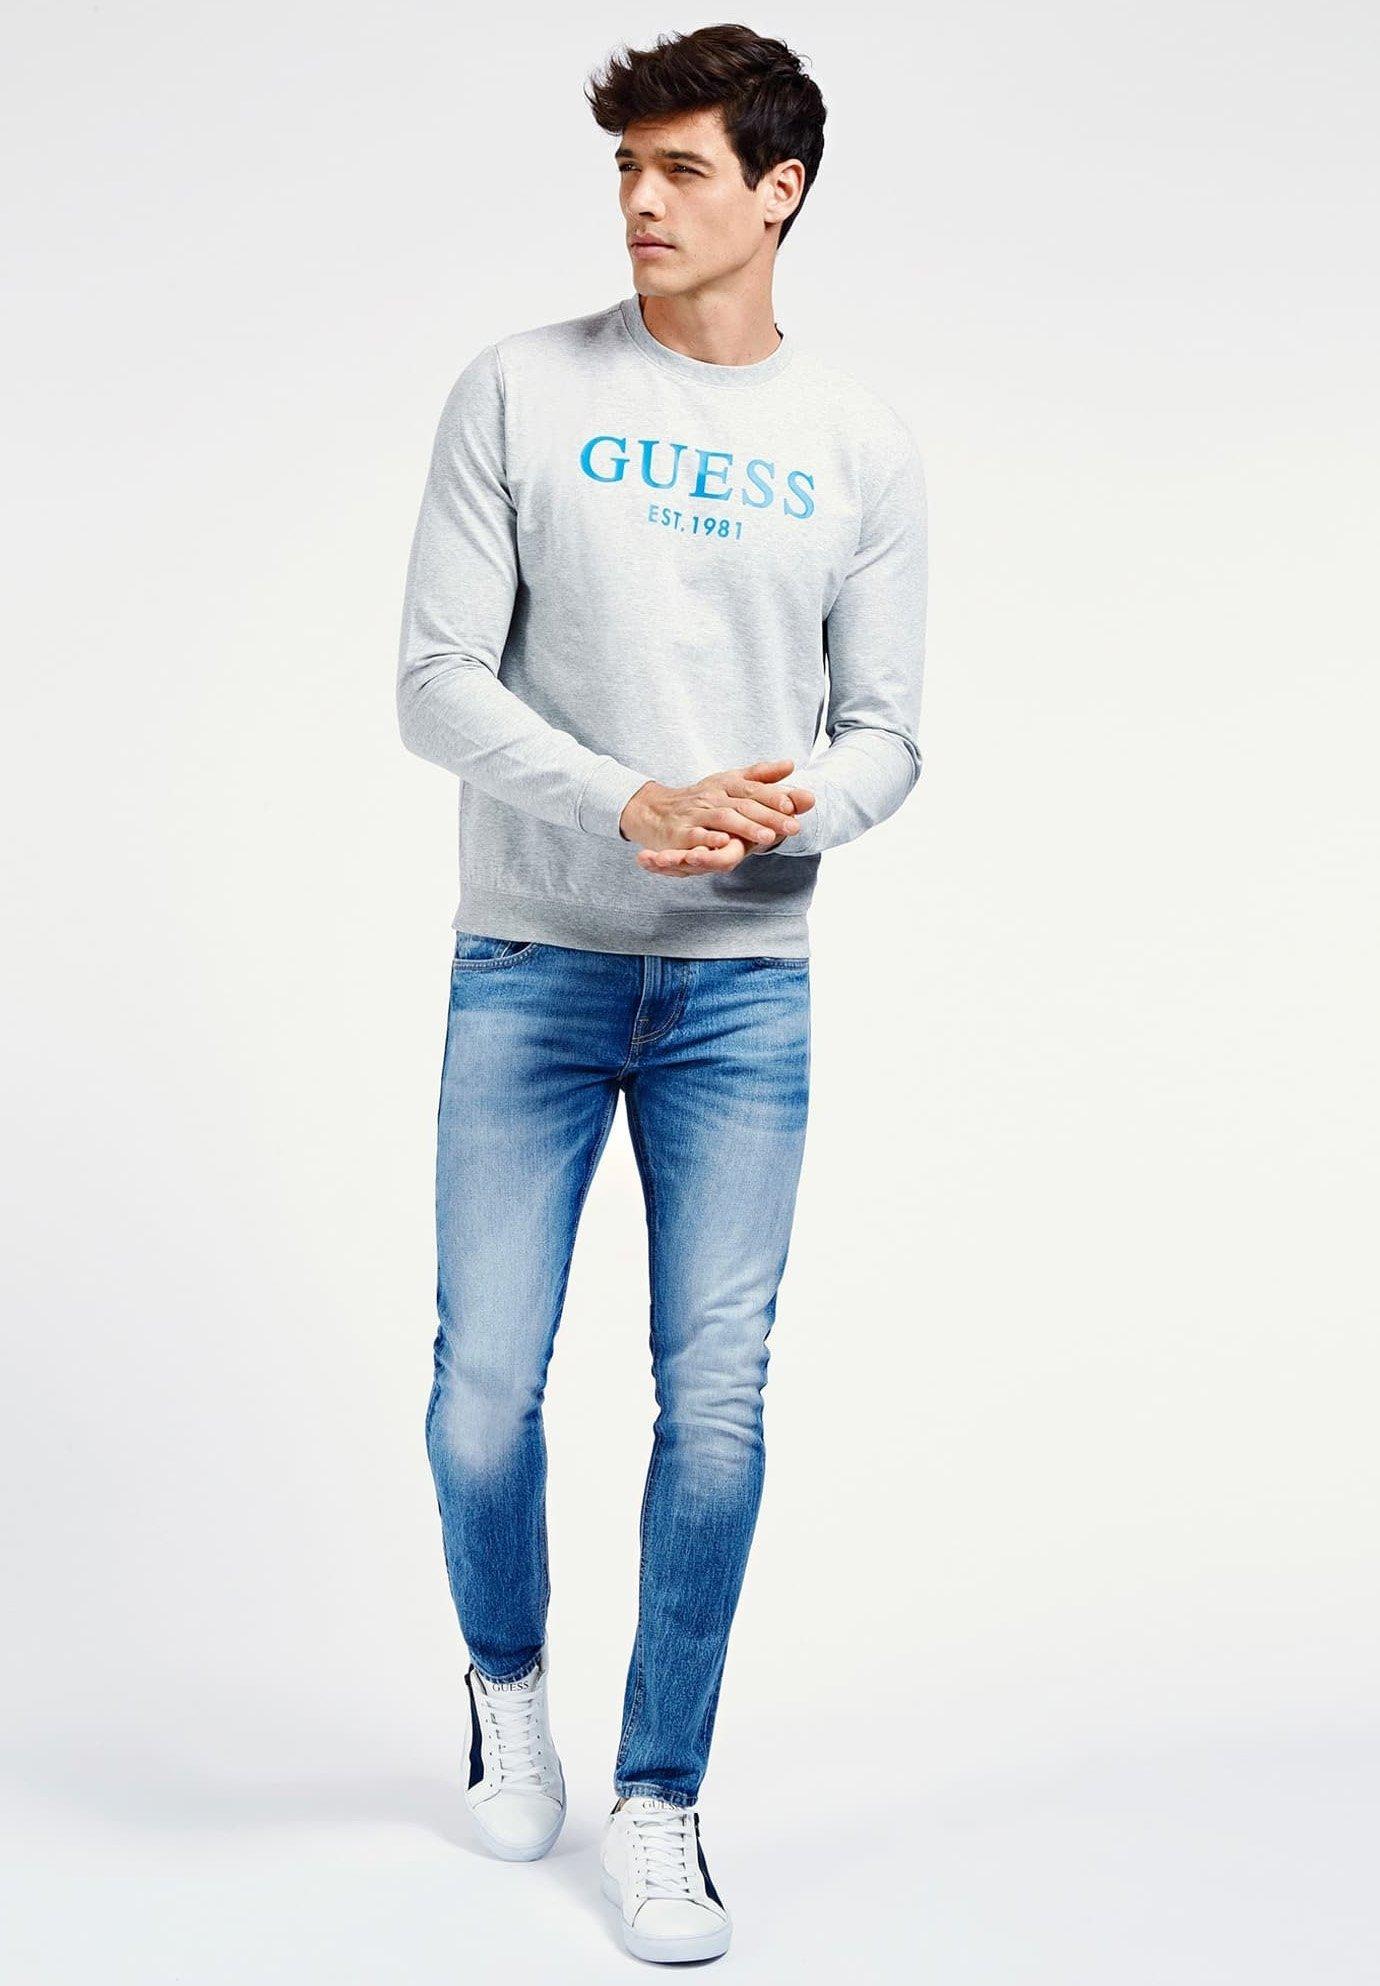 Guess Sweatshirt hellgrau ZALANDO.FR